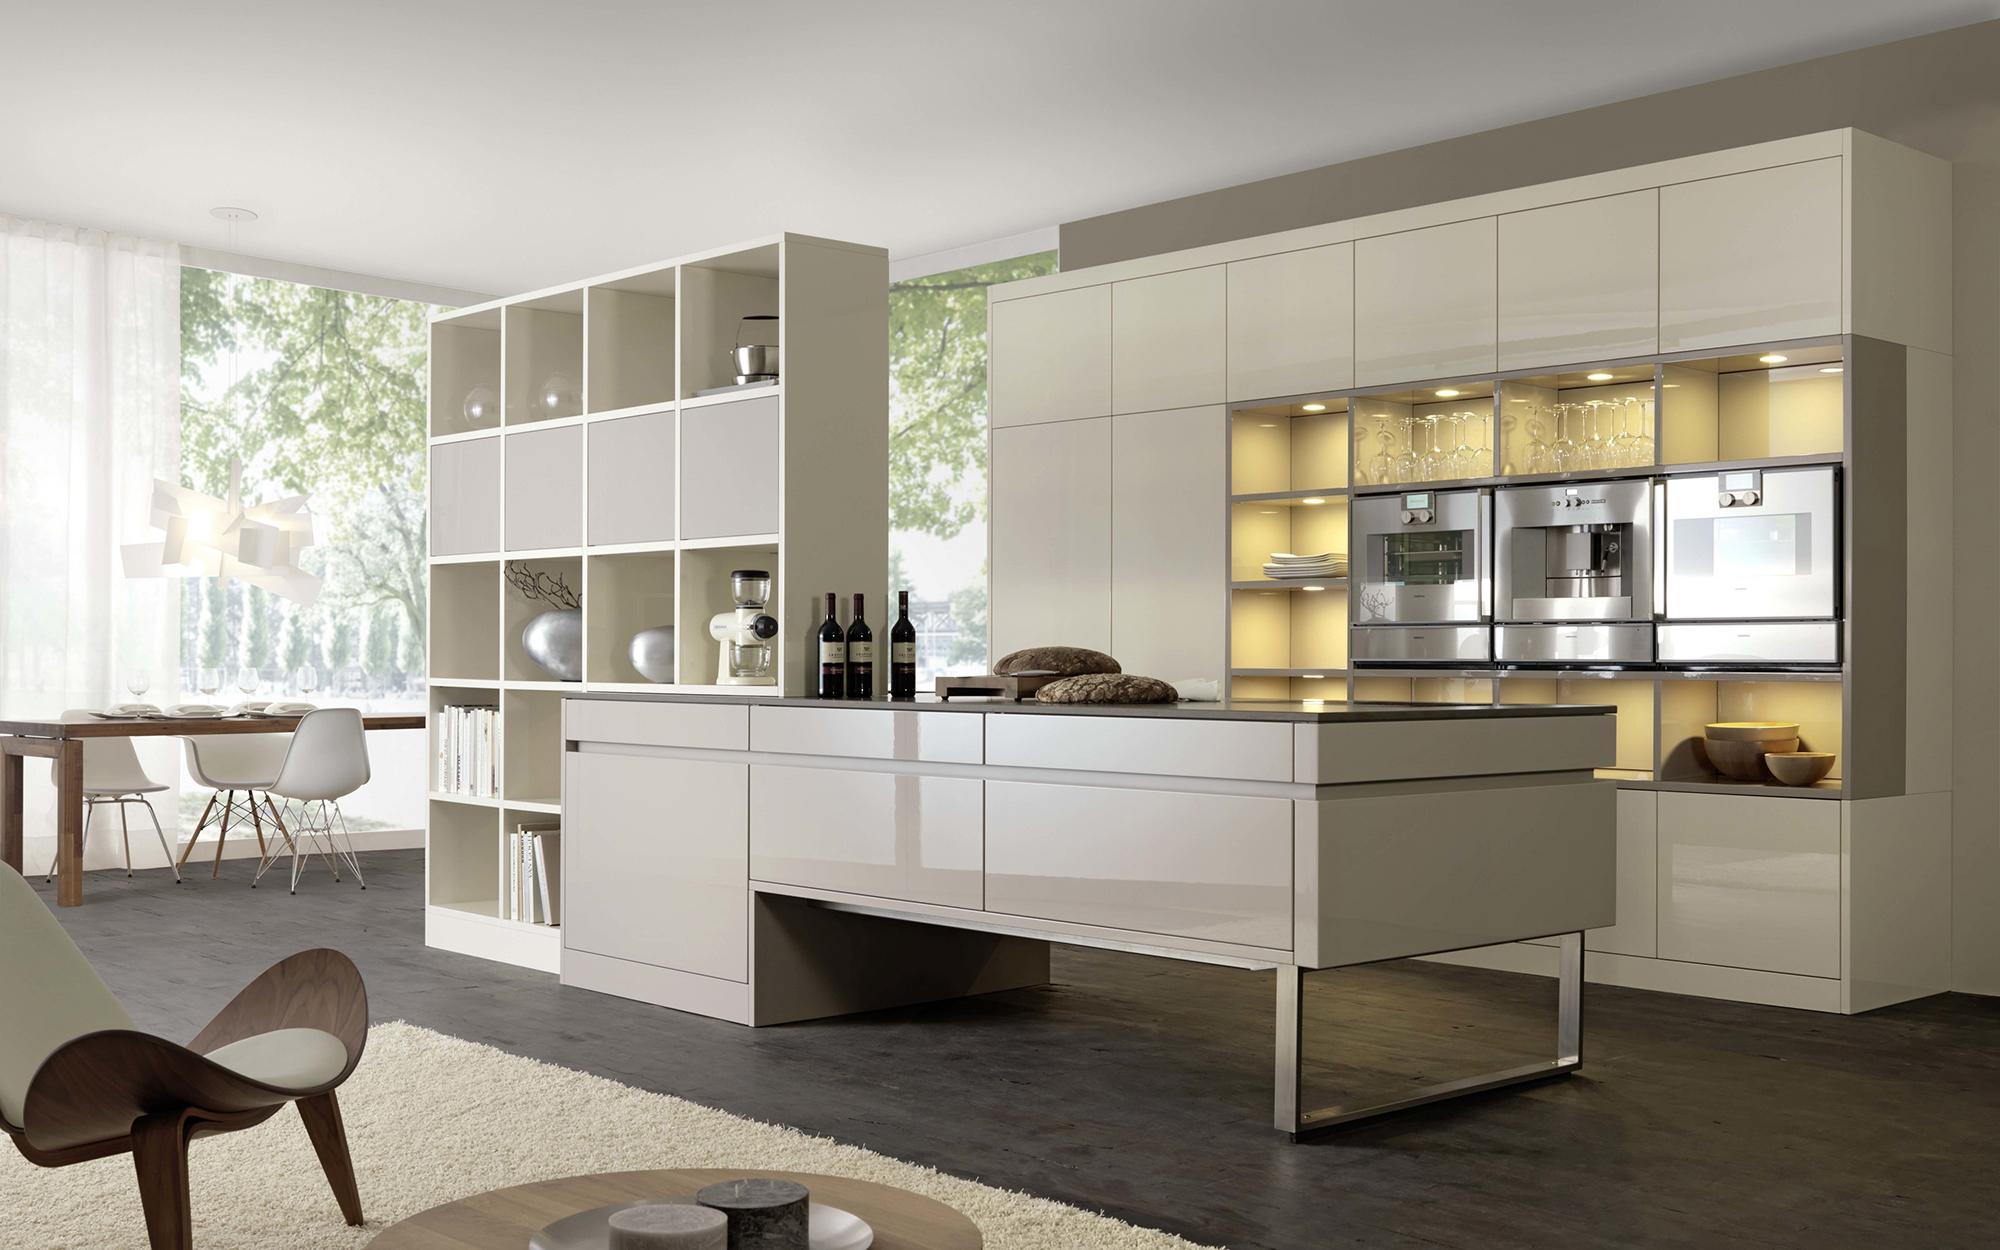 Глянцевая бежевая кухня в стиле хай-тек